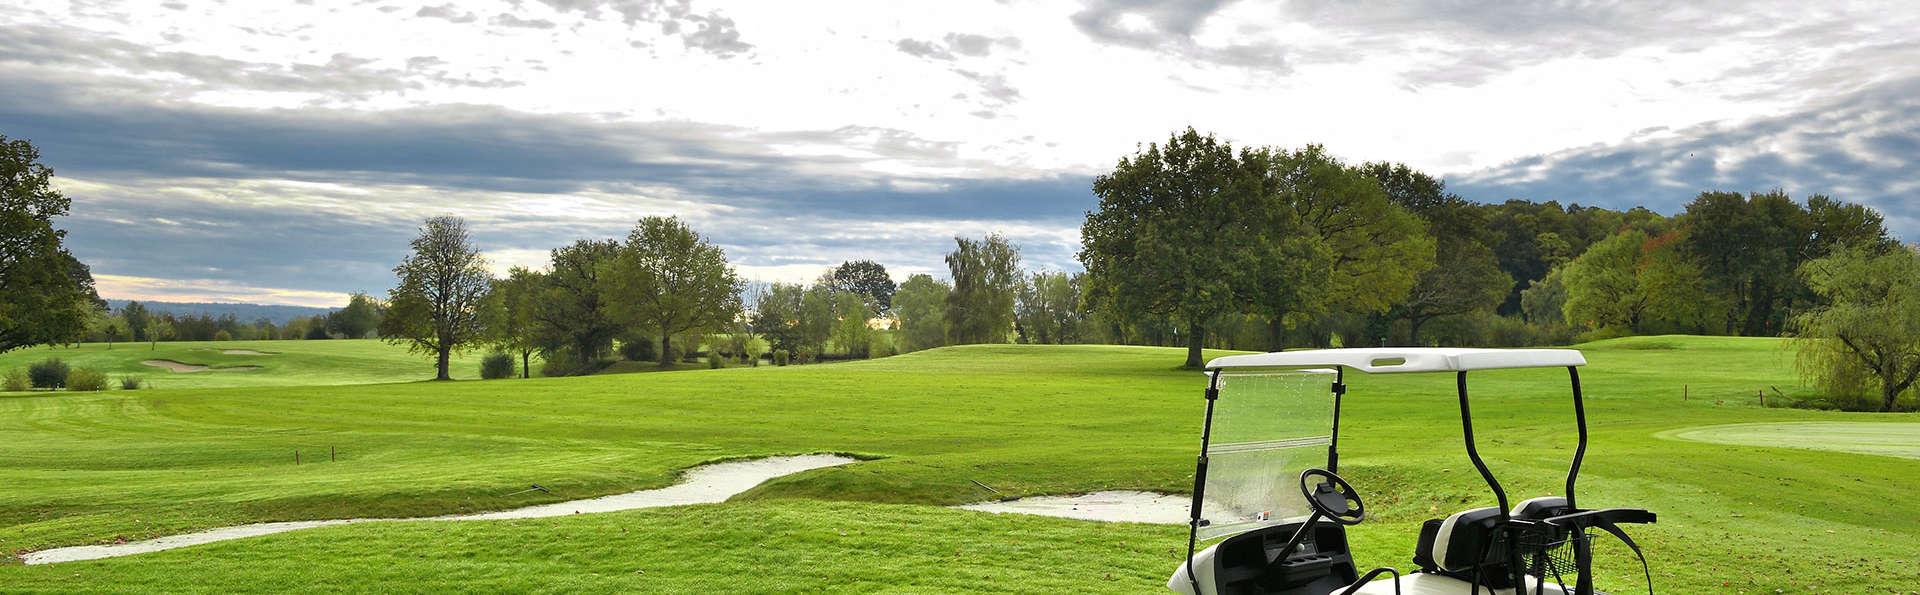 Hôtel Les Dryades Golf & Spa - EDIT_golf.jpg